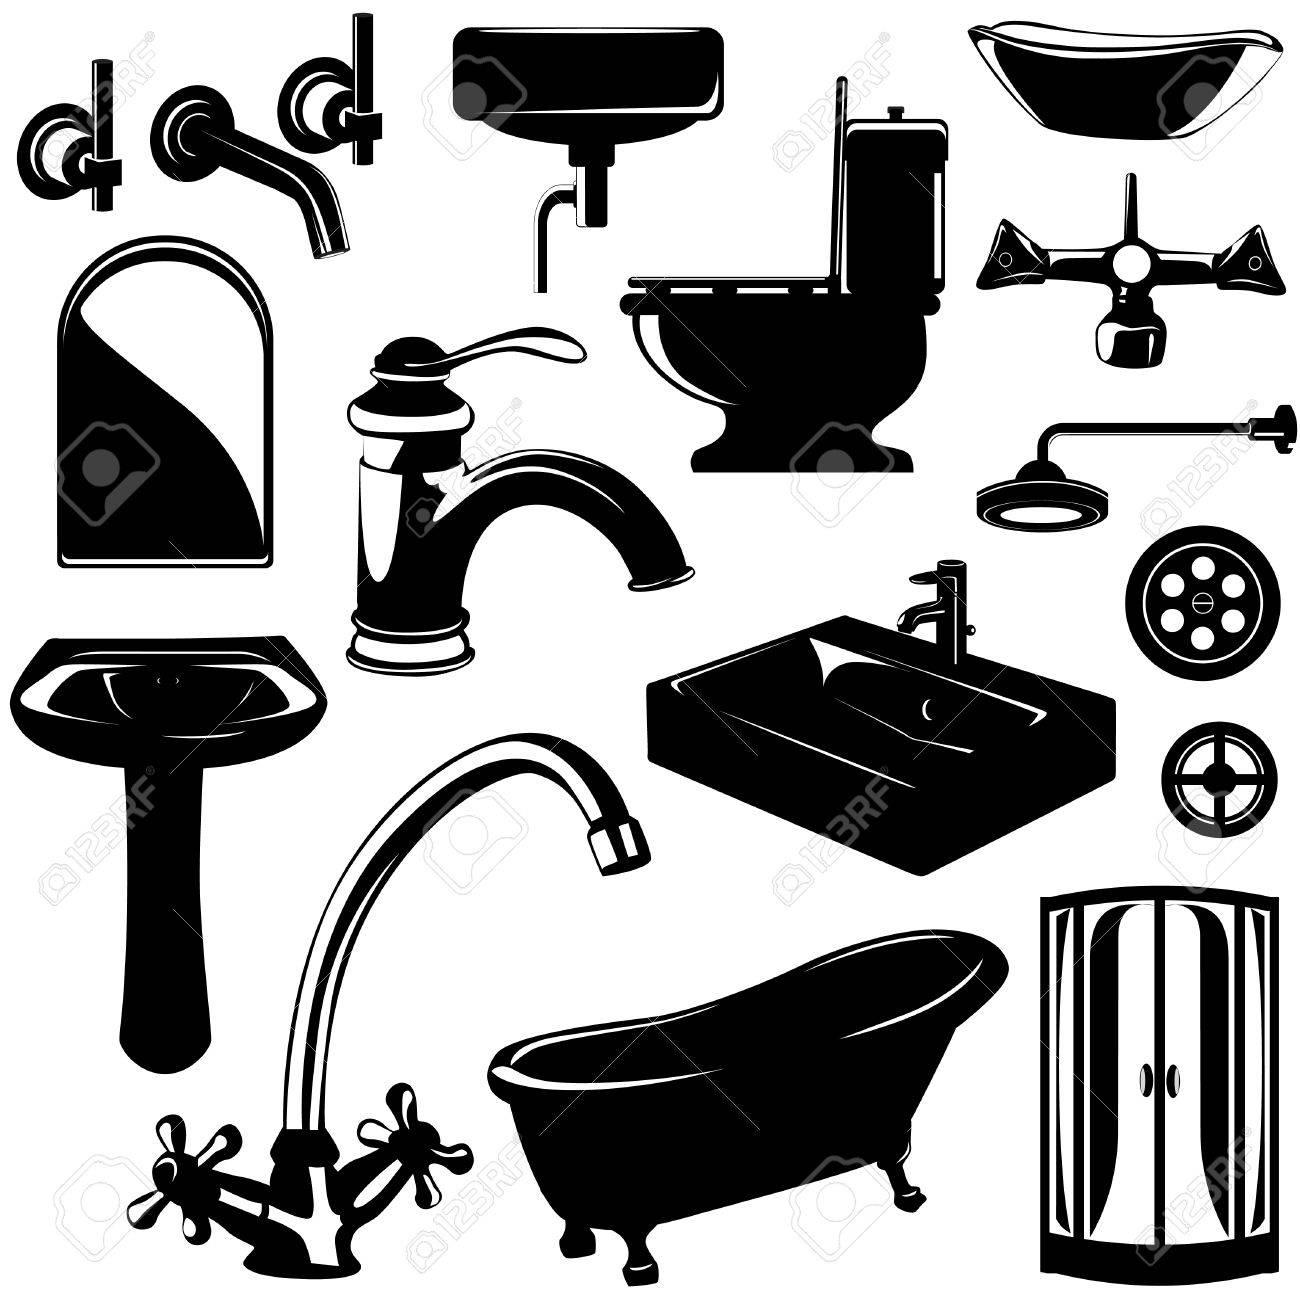 Bathroom sink clip art - Set Of Bathroom Objects Vector Stock Vector 8516057